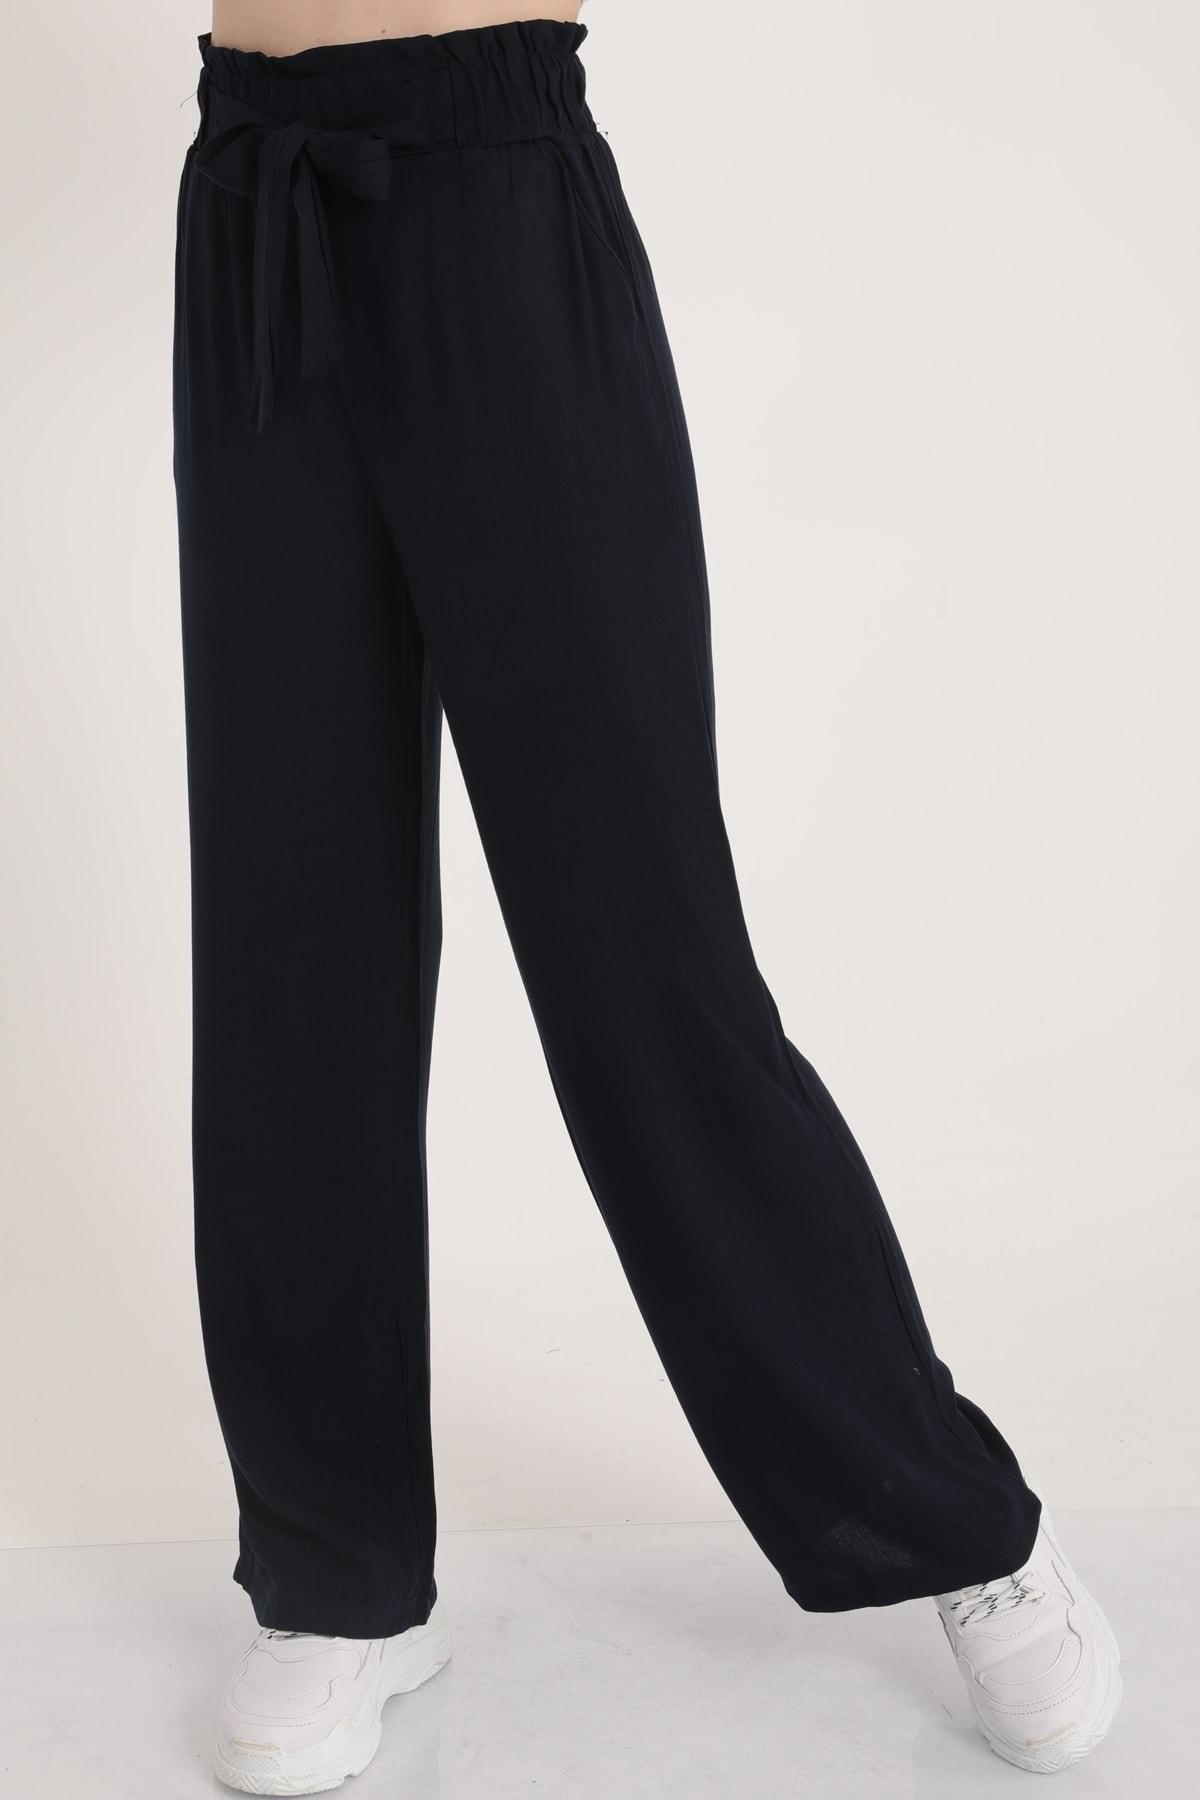 MD trend Kadın Lacivert Bel Lastikli Kemerli Salaş Pantolon  Mdt5181 2